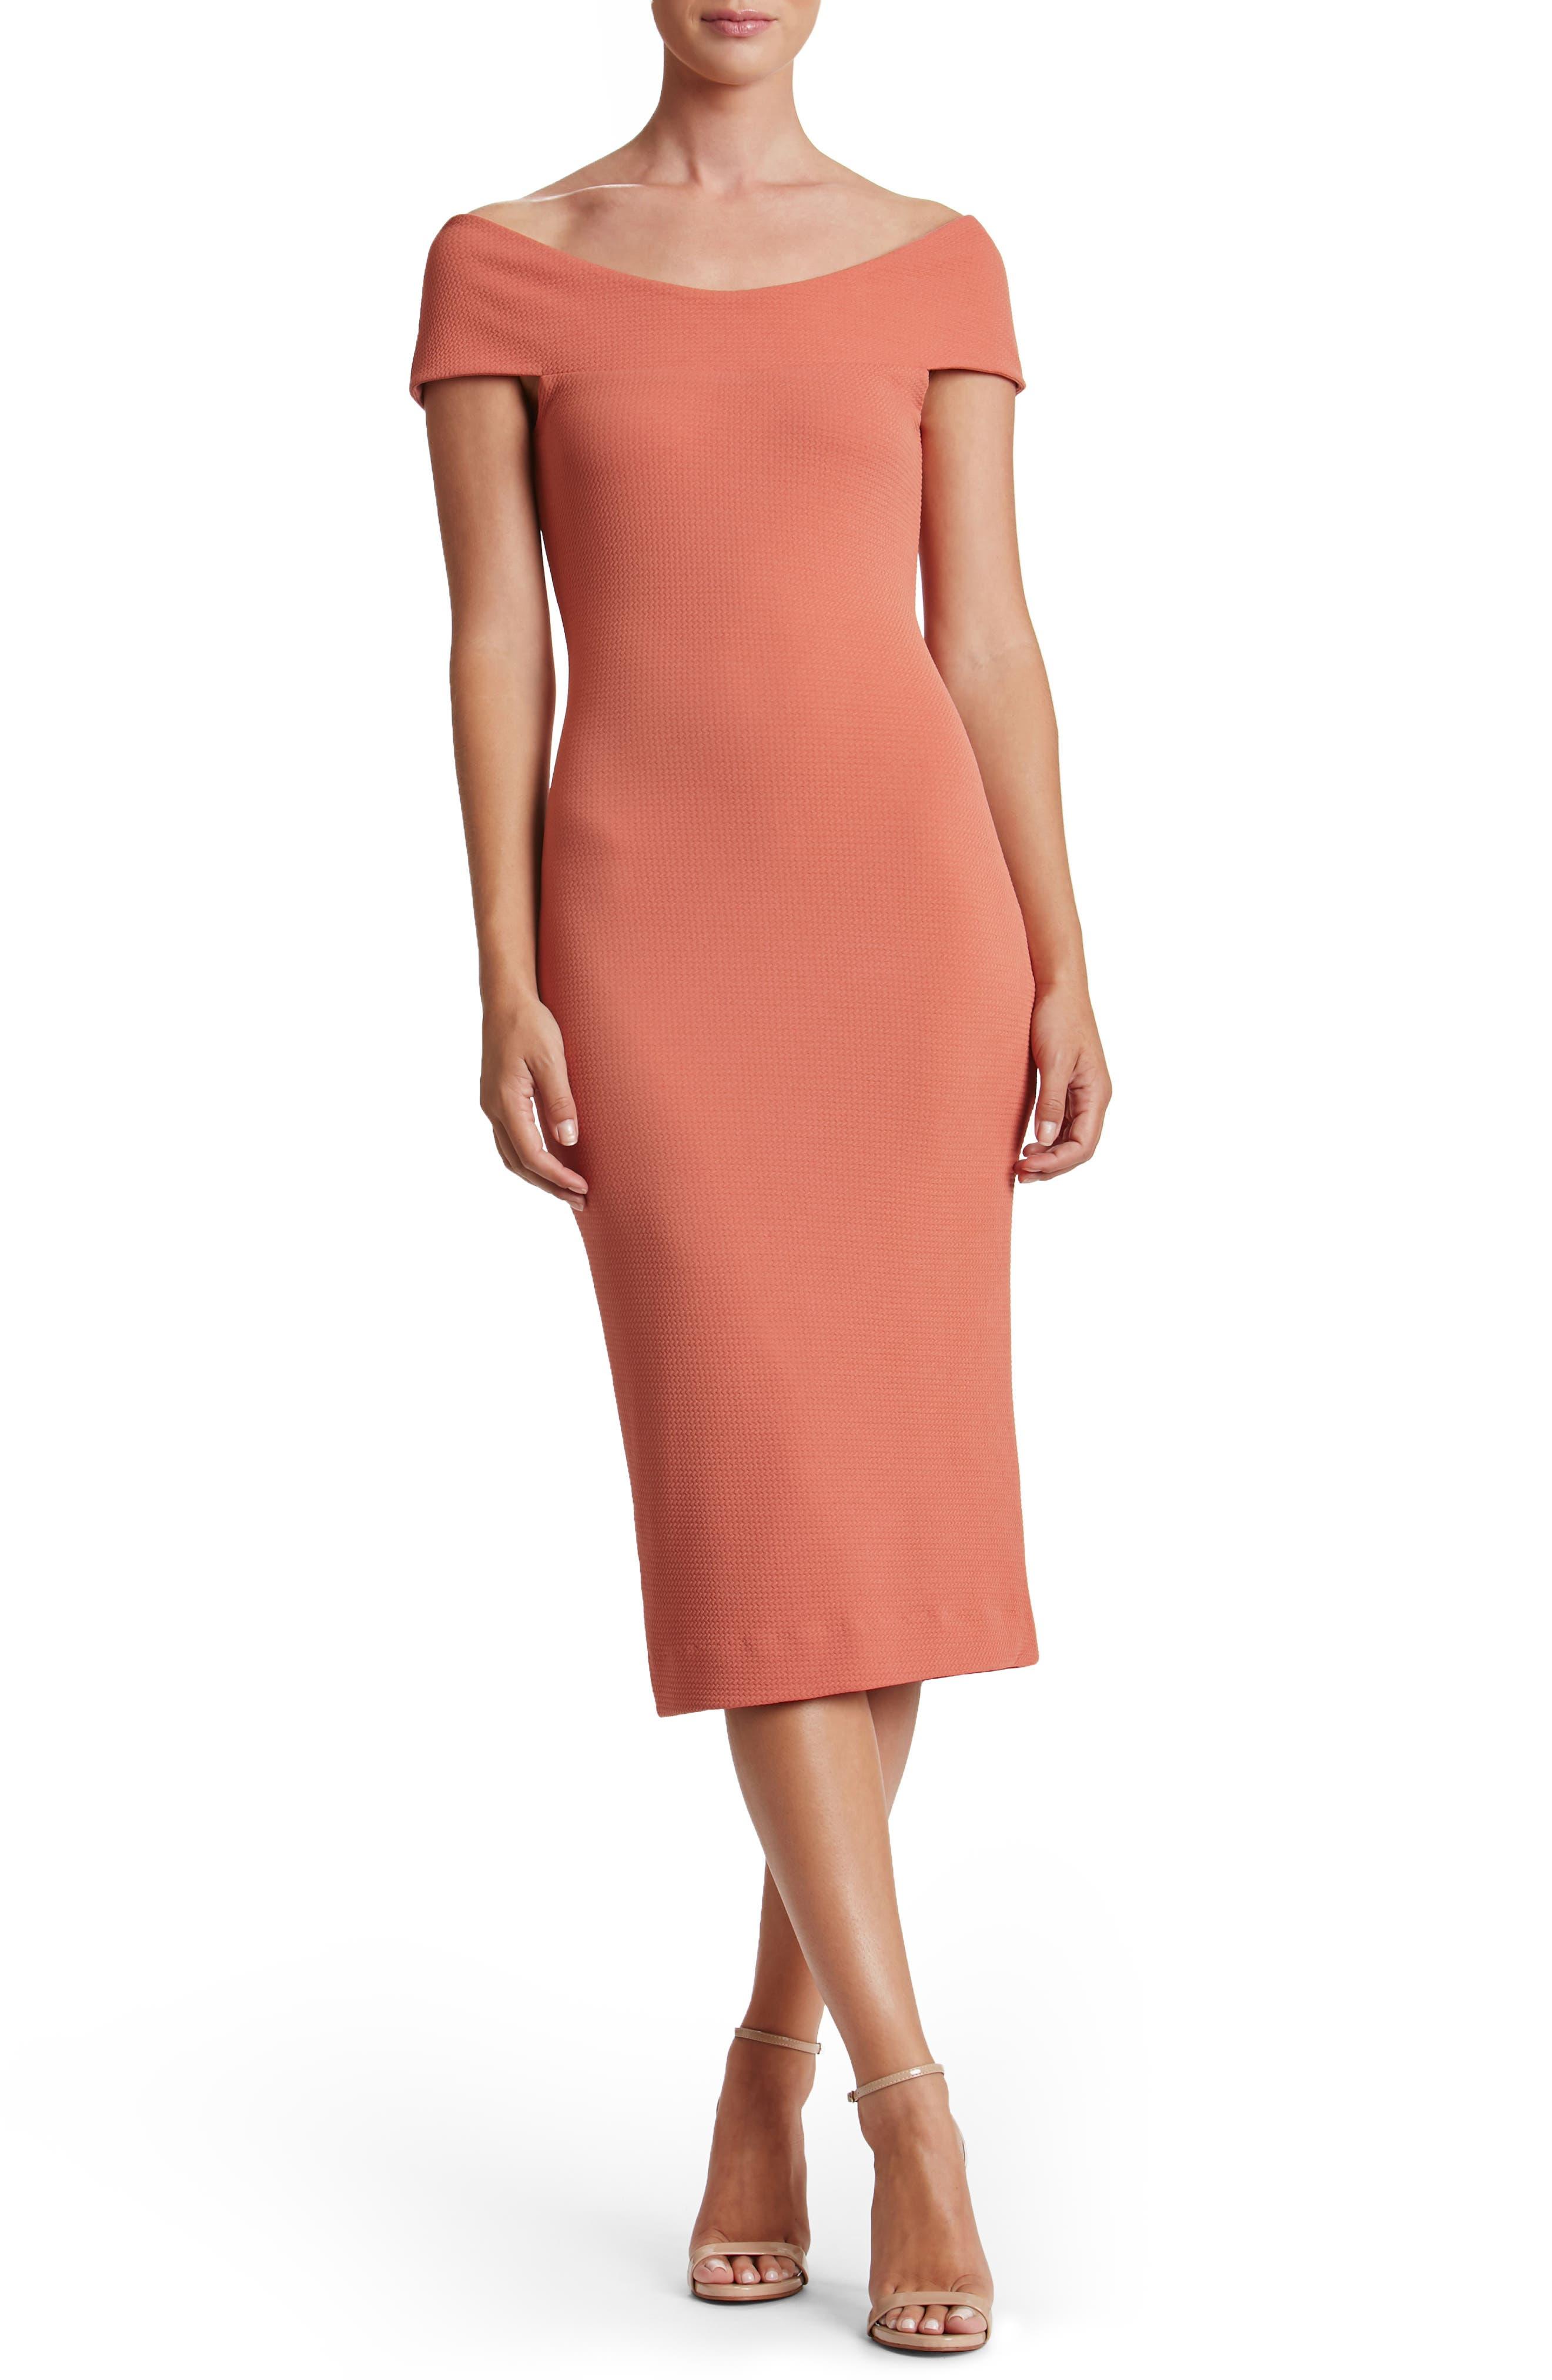 Main Image - Dress the Population Claudette Textured Dress